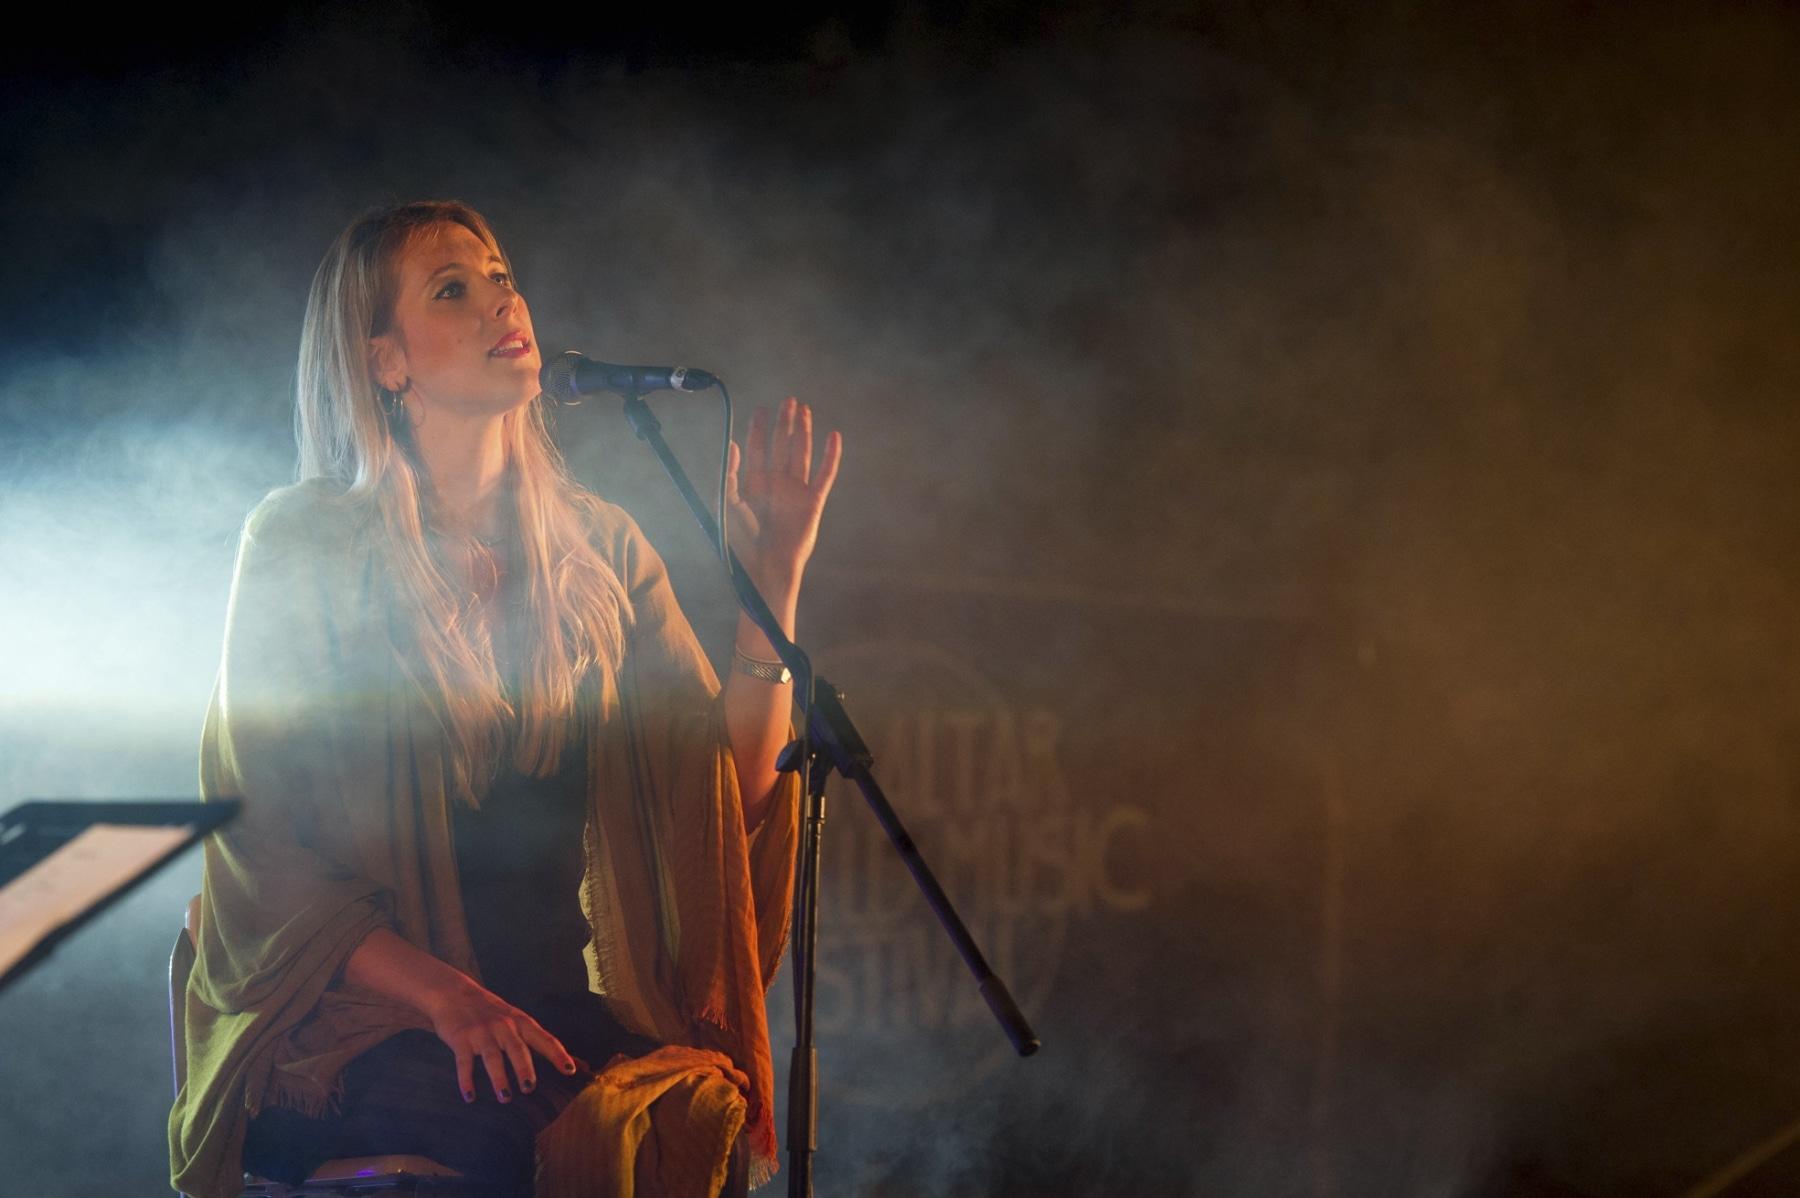 19-mayo-gibraltar-world-music-festival36_14463039232_o